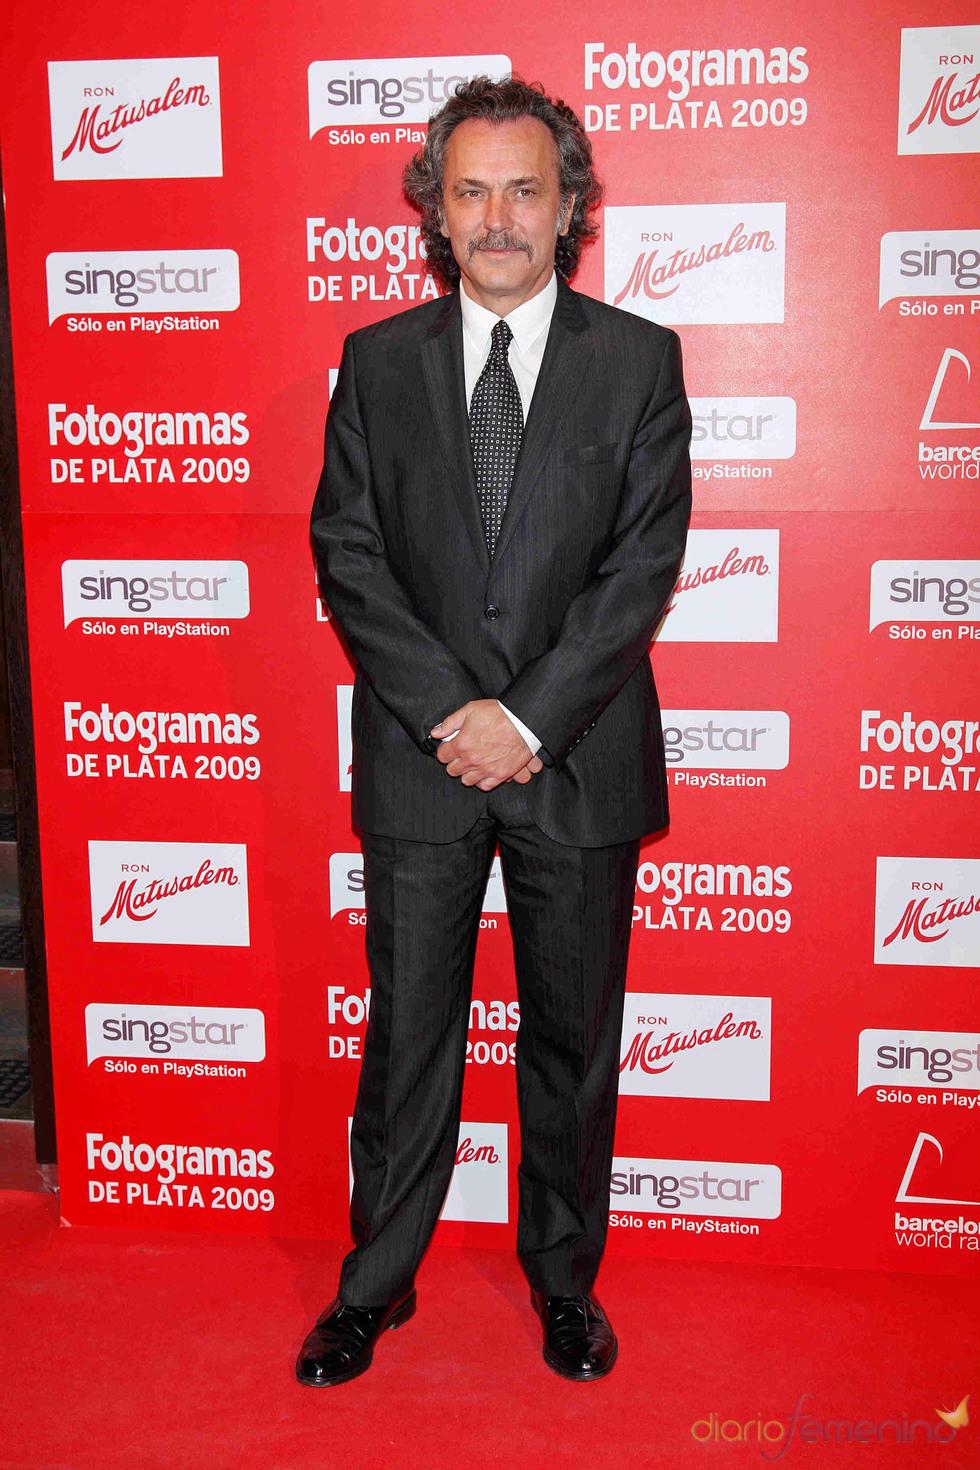 Fotogramas de Plata 2009: José Coronado